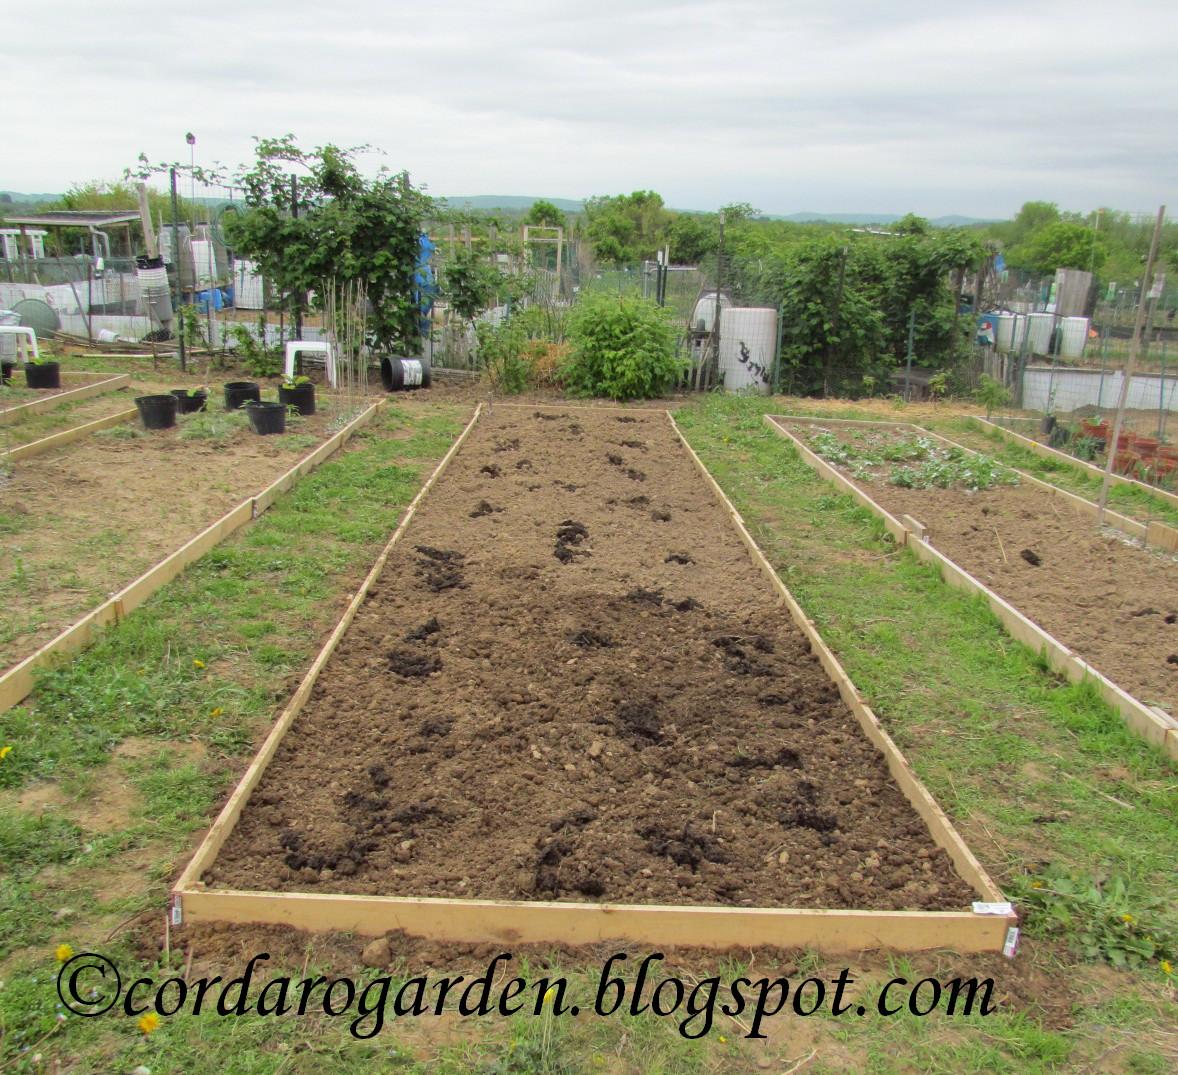 The Gardener of Eden: The Plots on May 13